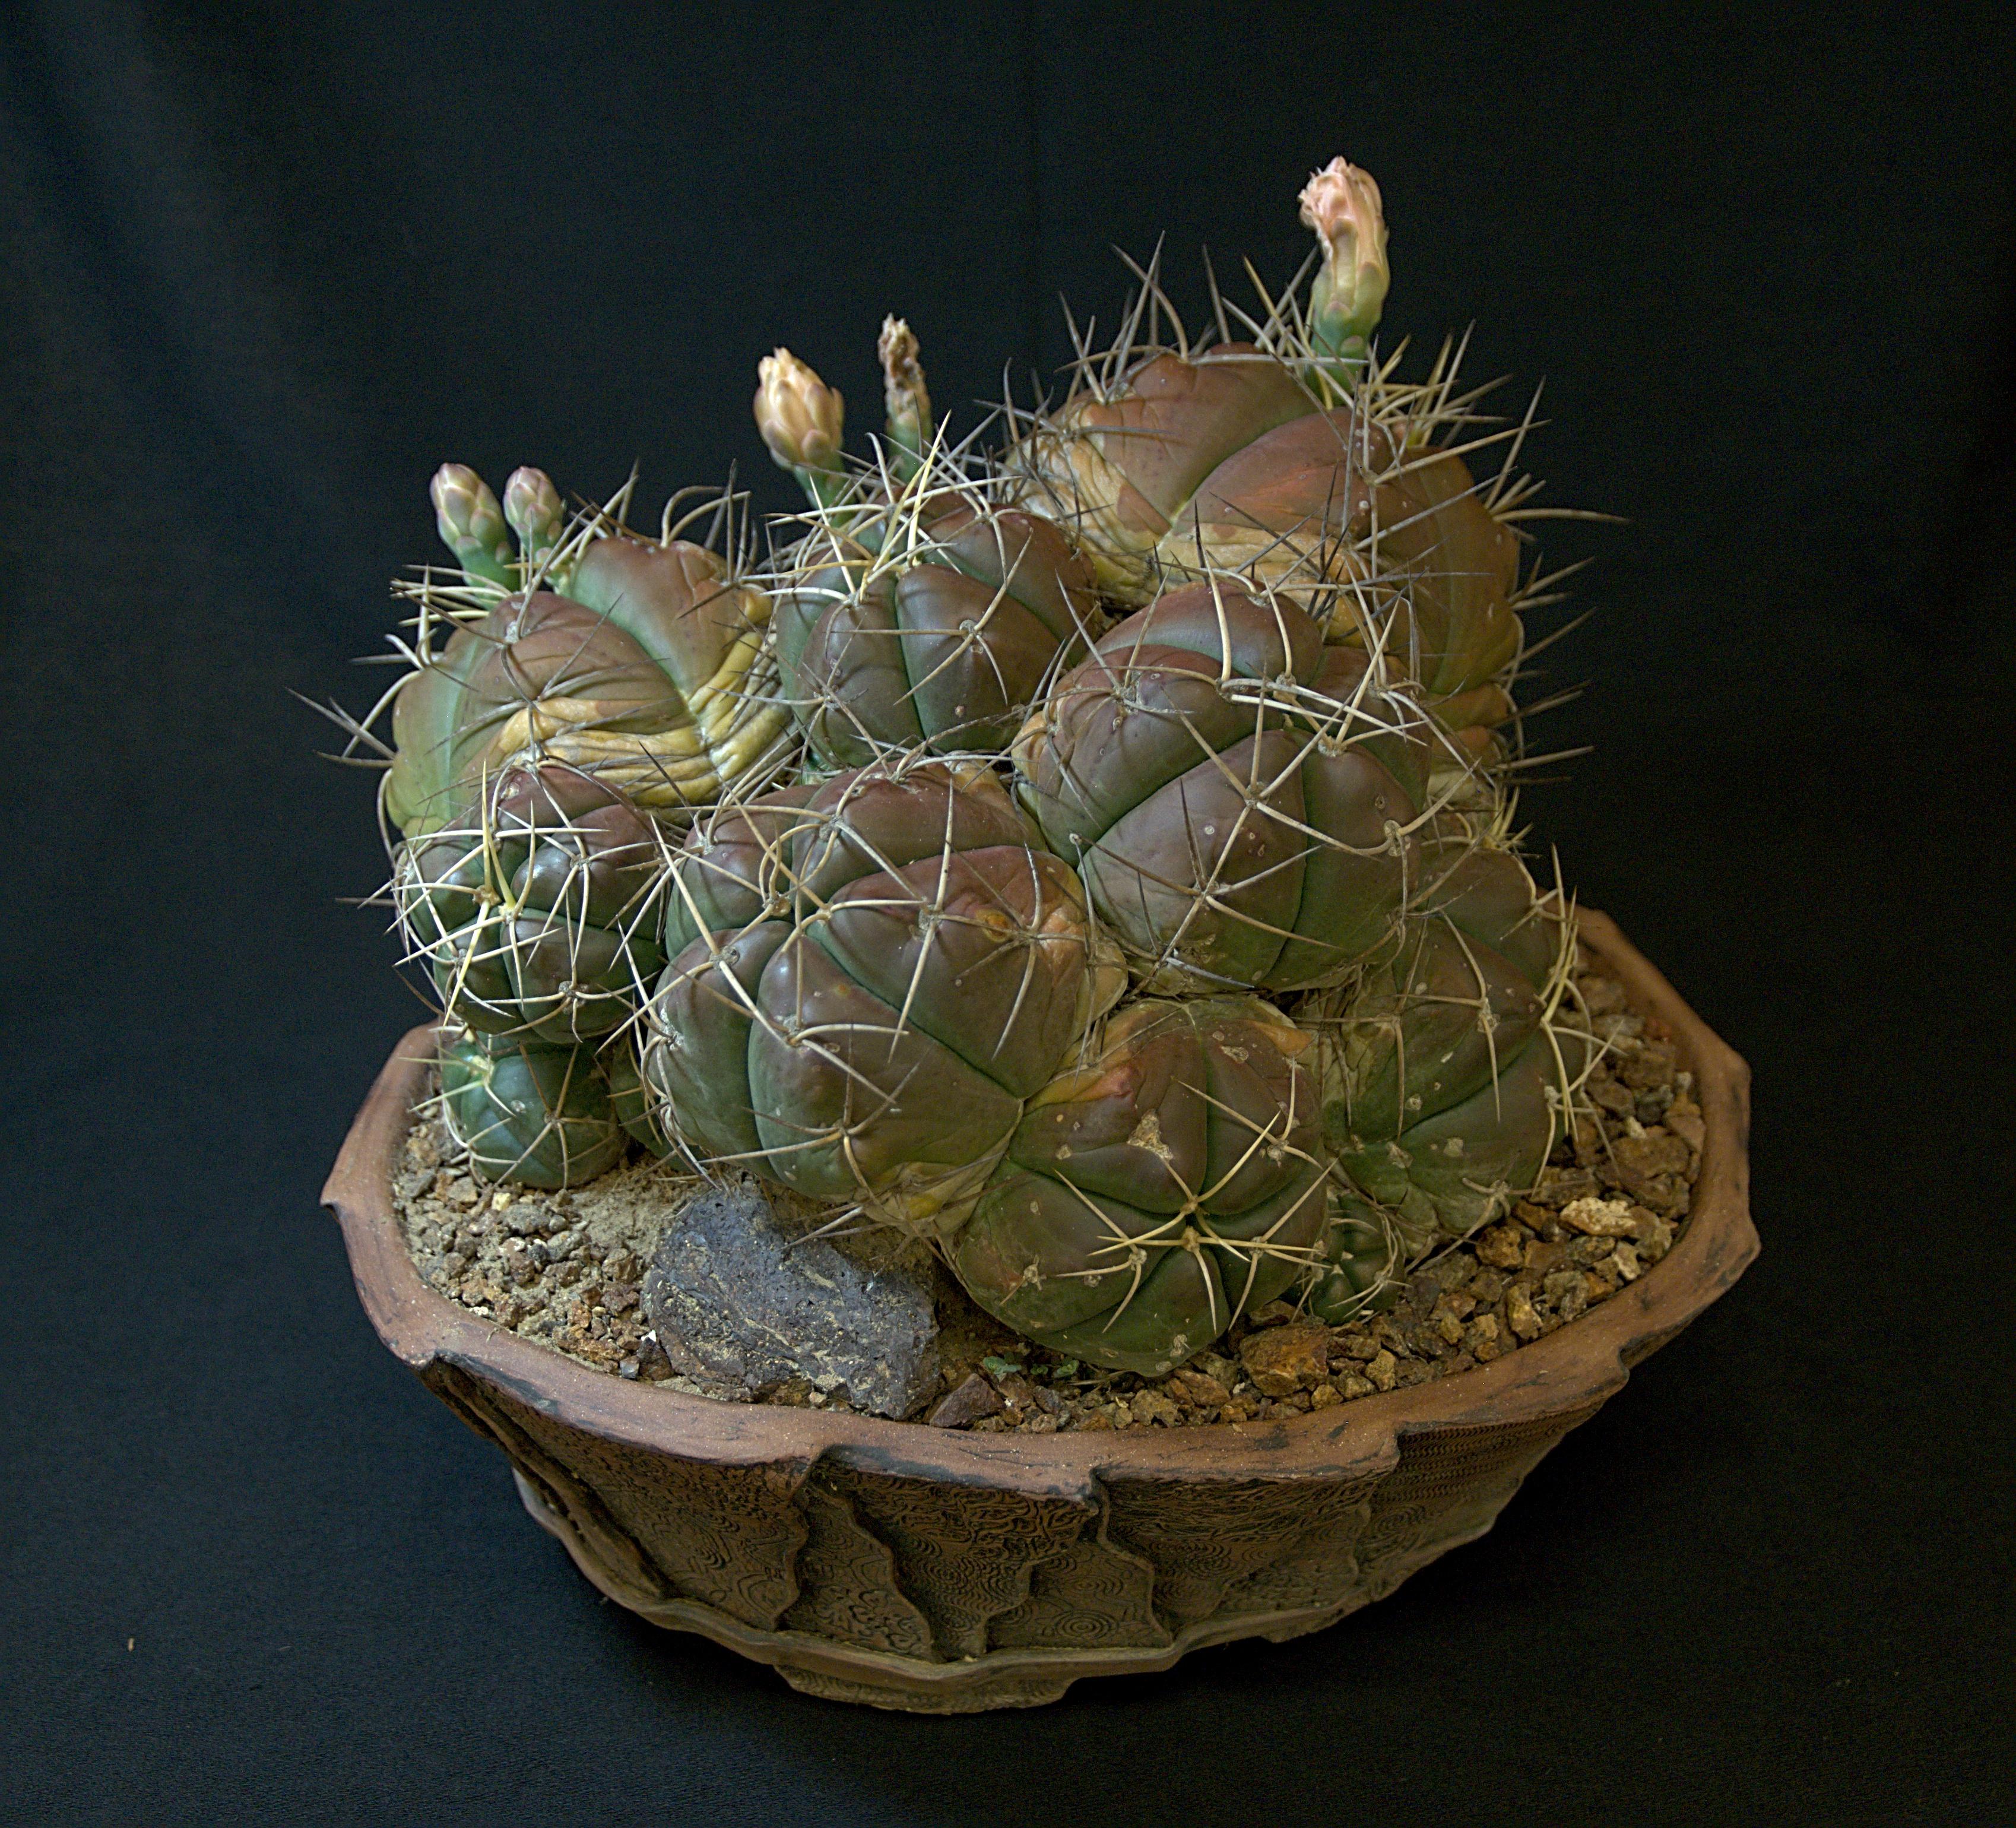 SCCSS 2018 June - Winner Open Cactus - Gary Duke - Gymnocalycium horstii